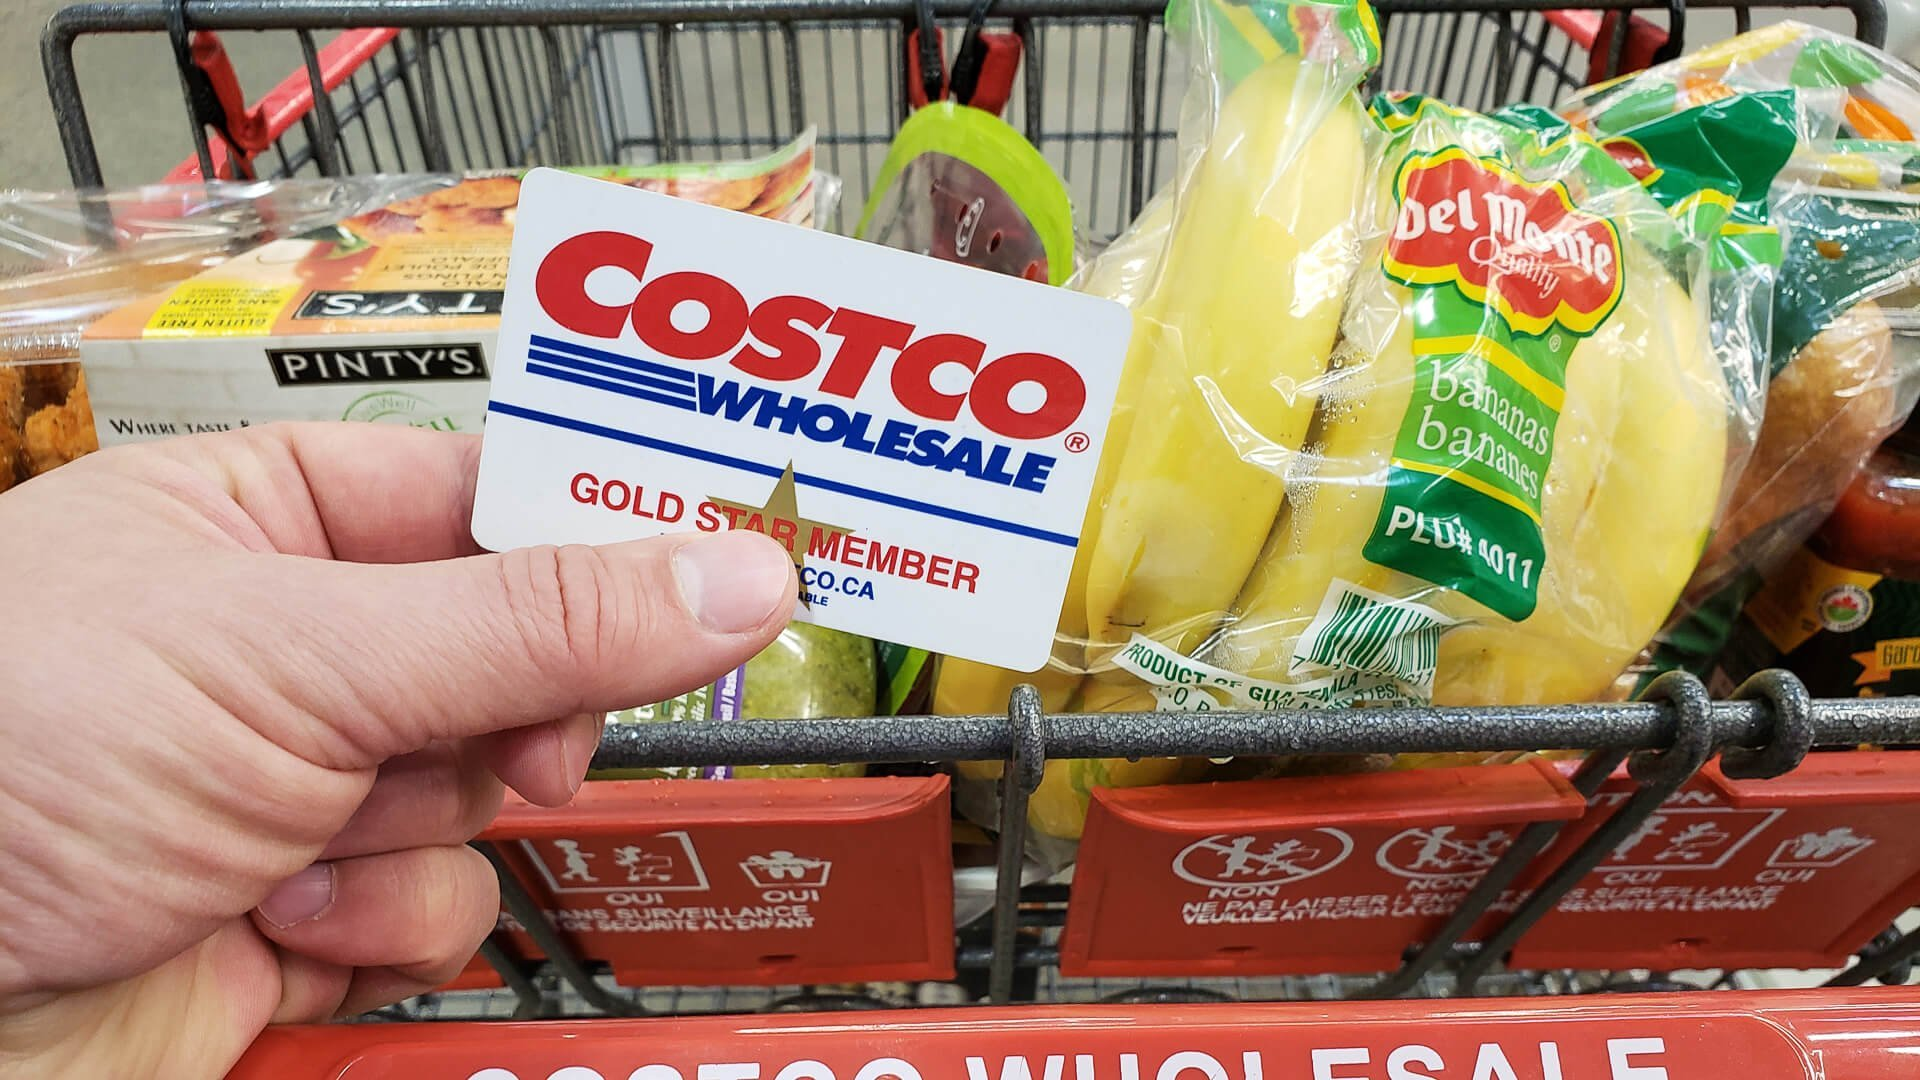 Expert Costco shopping tips